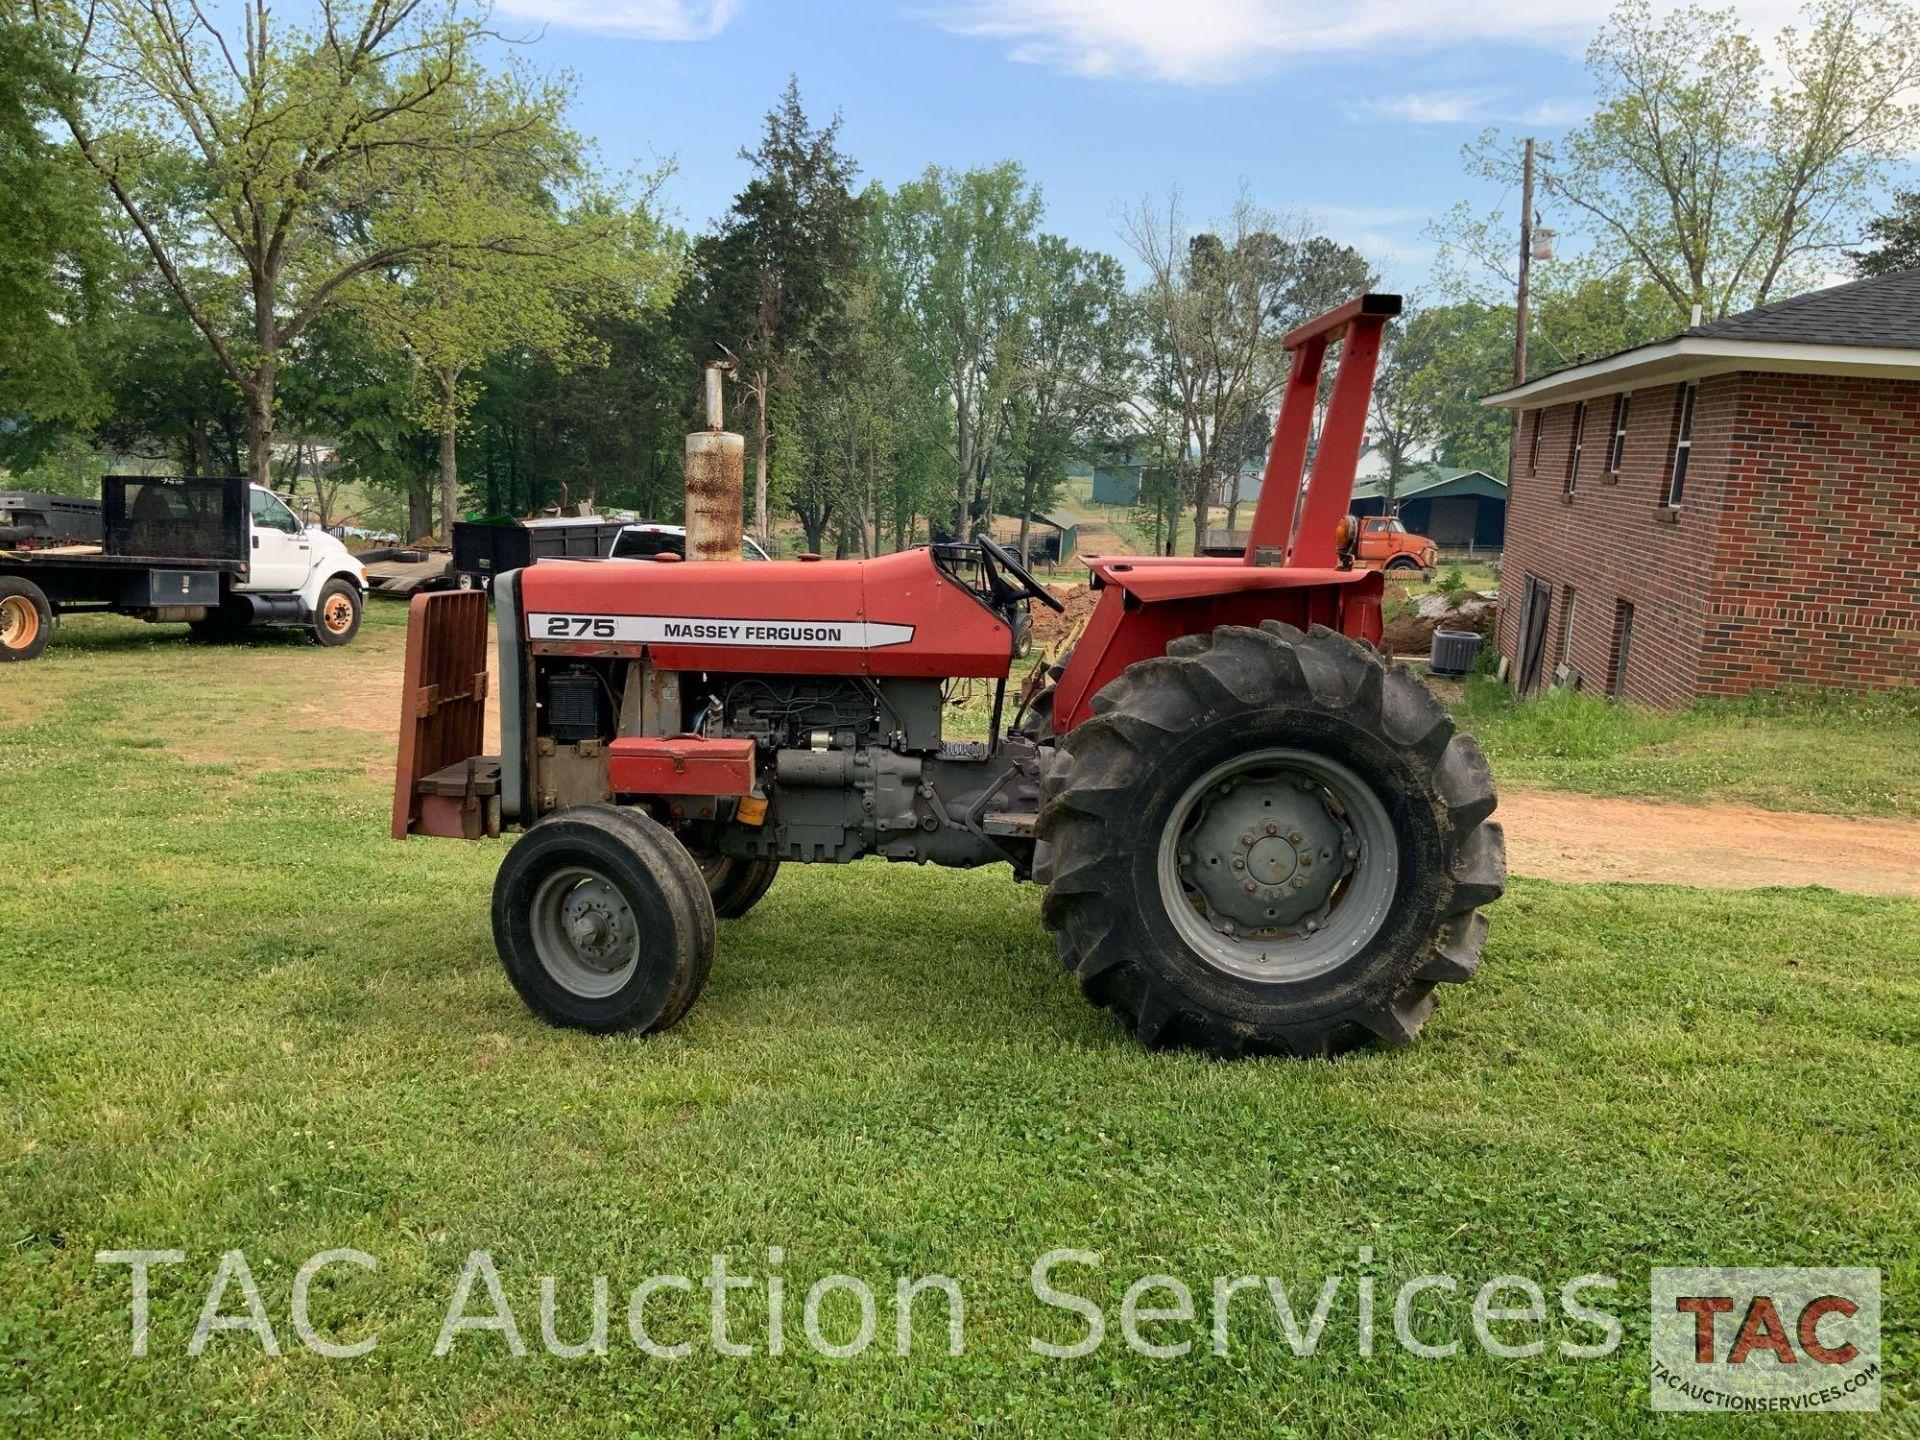 Massey Ferguson 275 Farm Tractor - Image 9 of 25